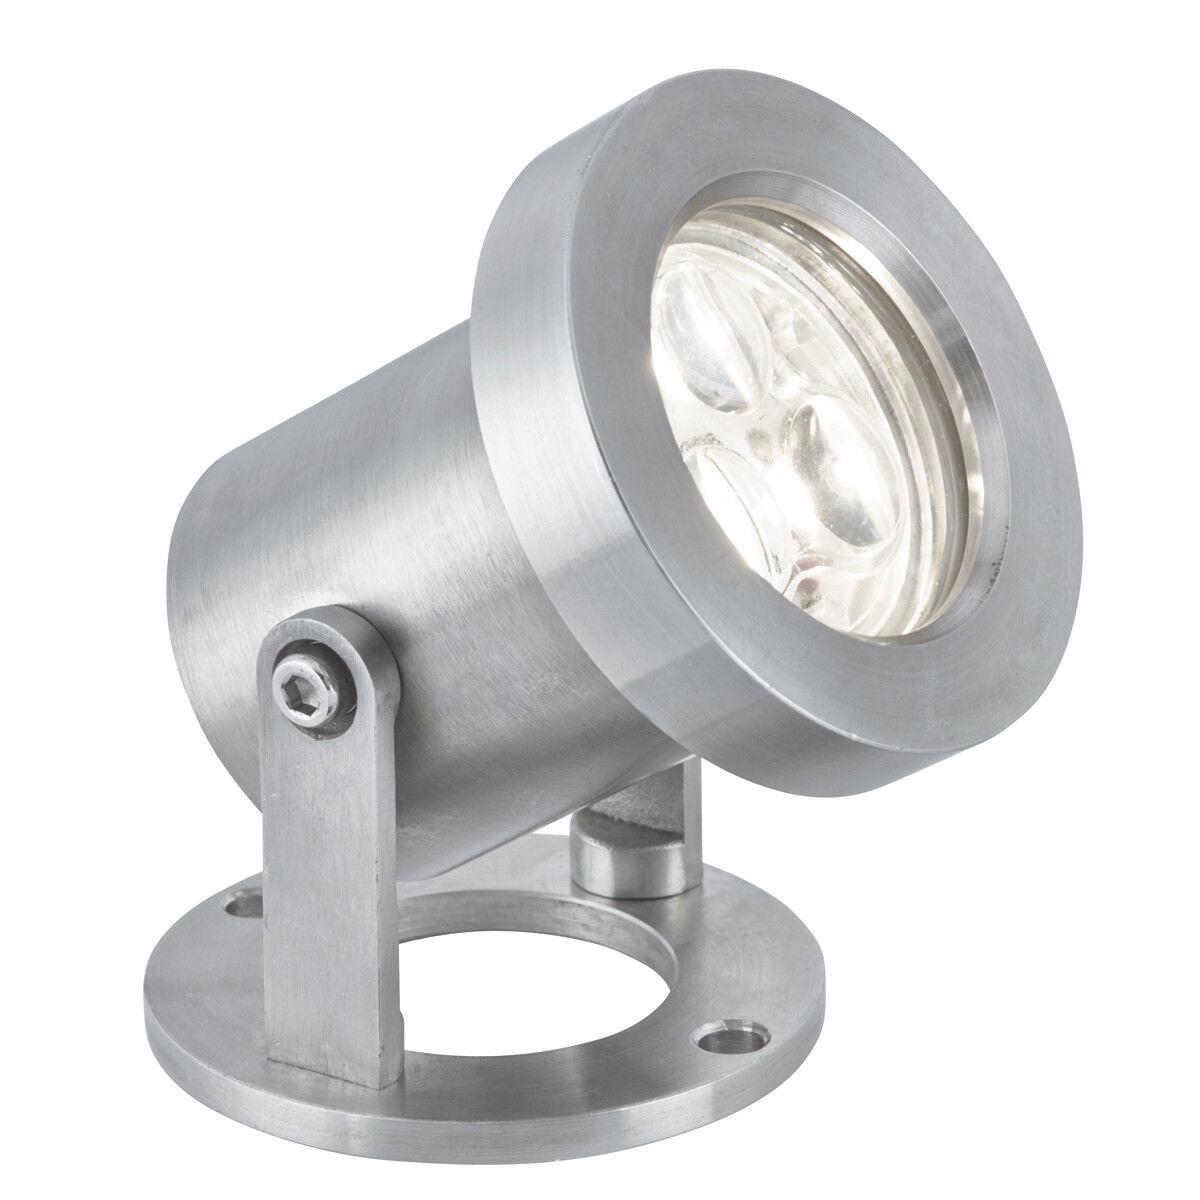 Reflector De Acero Inoxidable 6223SS IP65 LED Proyector al aire libre